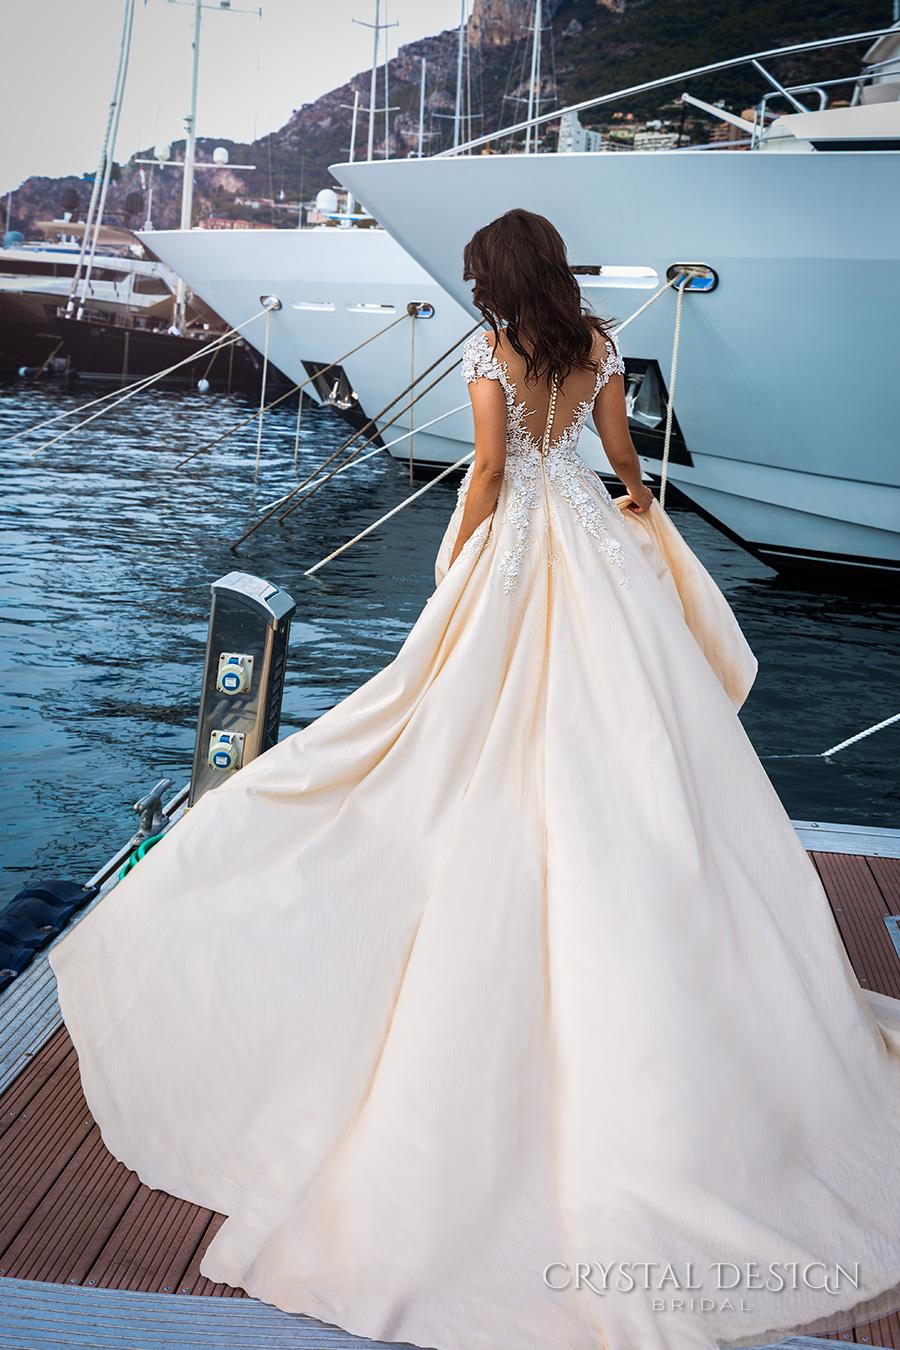 crystal design 2017 bridal cap sleeves v neck heavily embellished bodice lace embroidered romantic princess ivory creame color a  line wedding dress v back long train (atico) bv